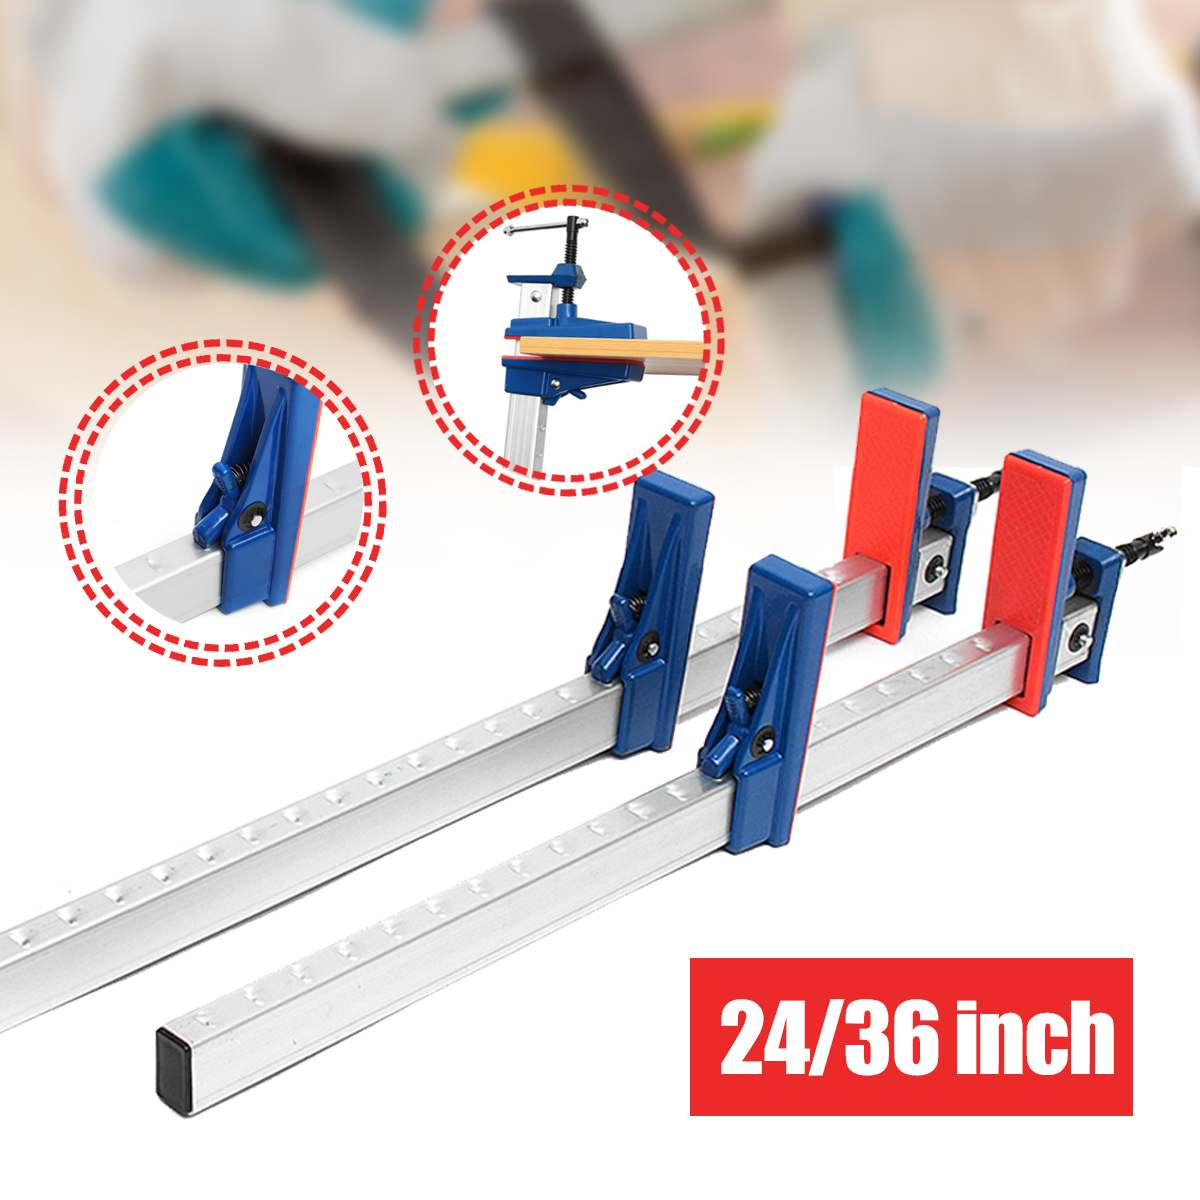 Aliexpress Com 24 36 Inch F Type Clamp Bar Heavy Duty Holder Grip